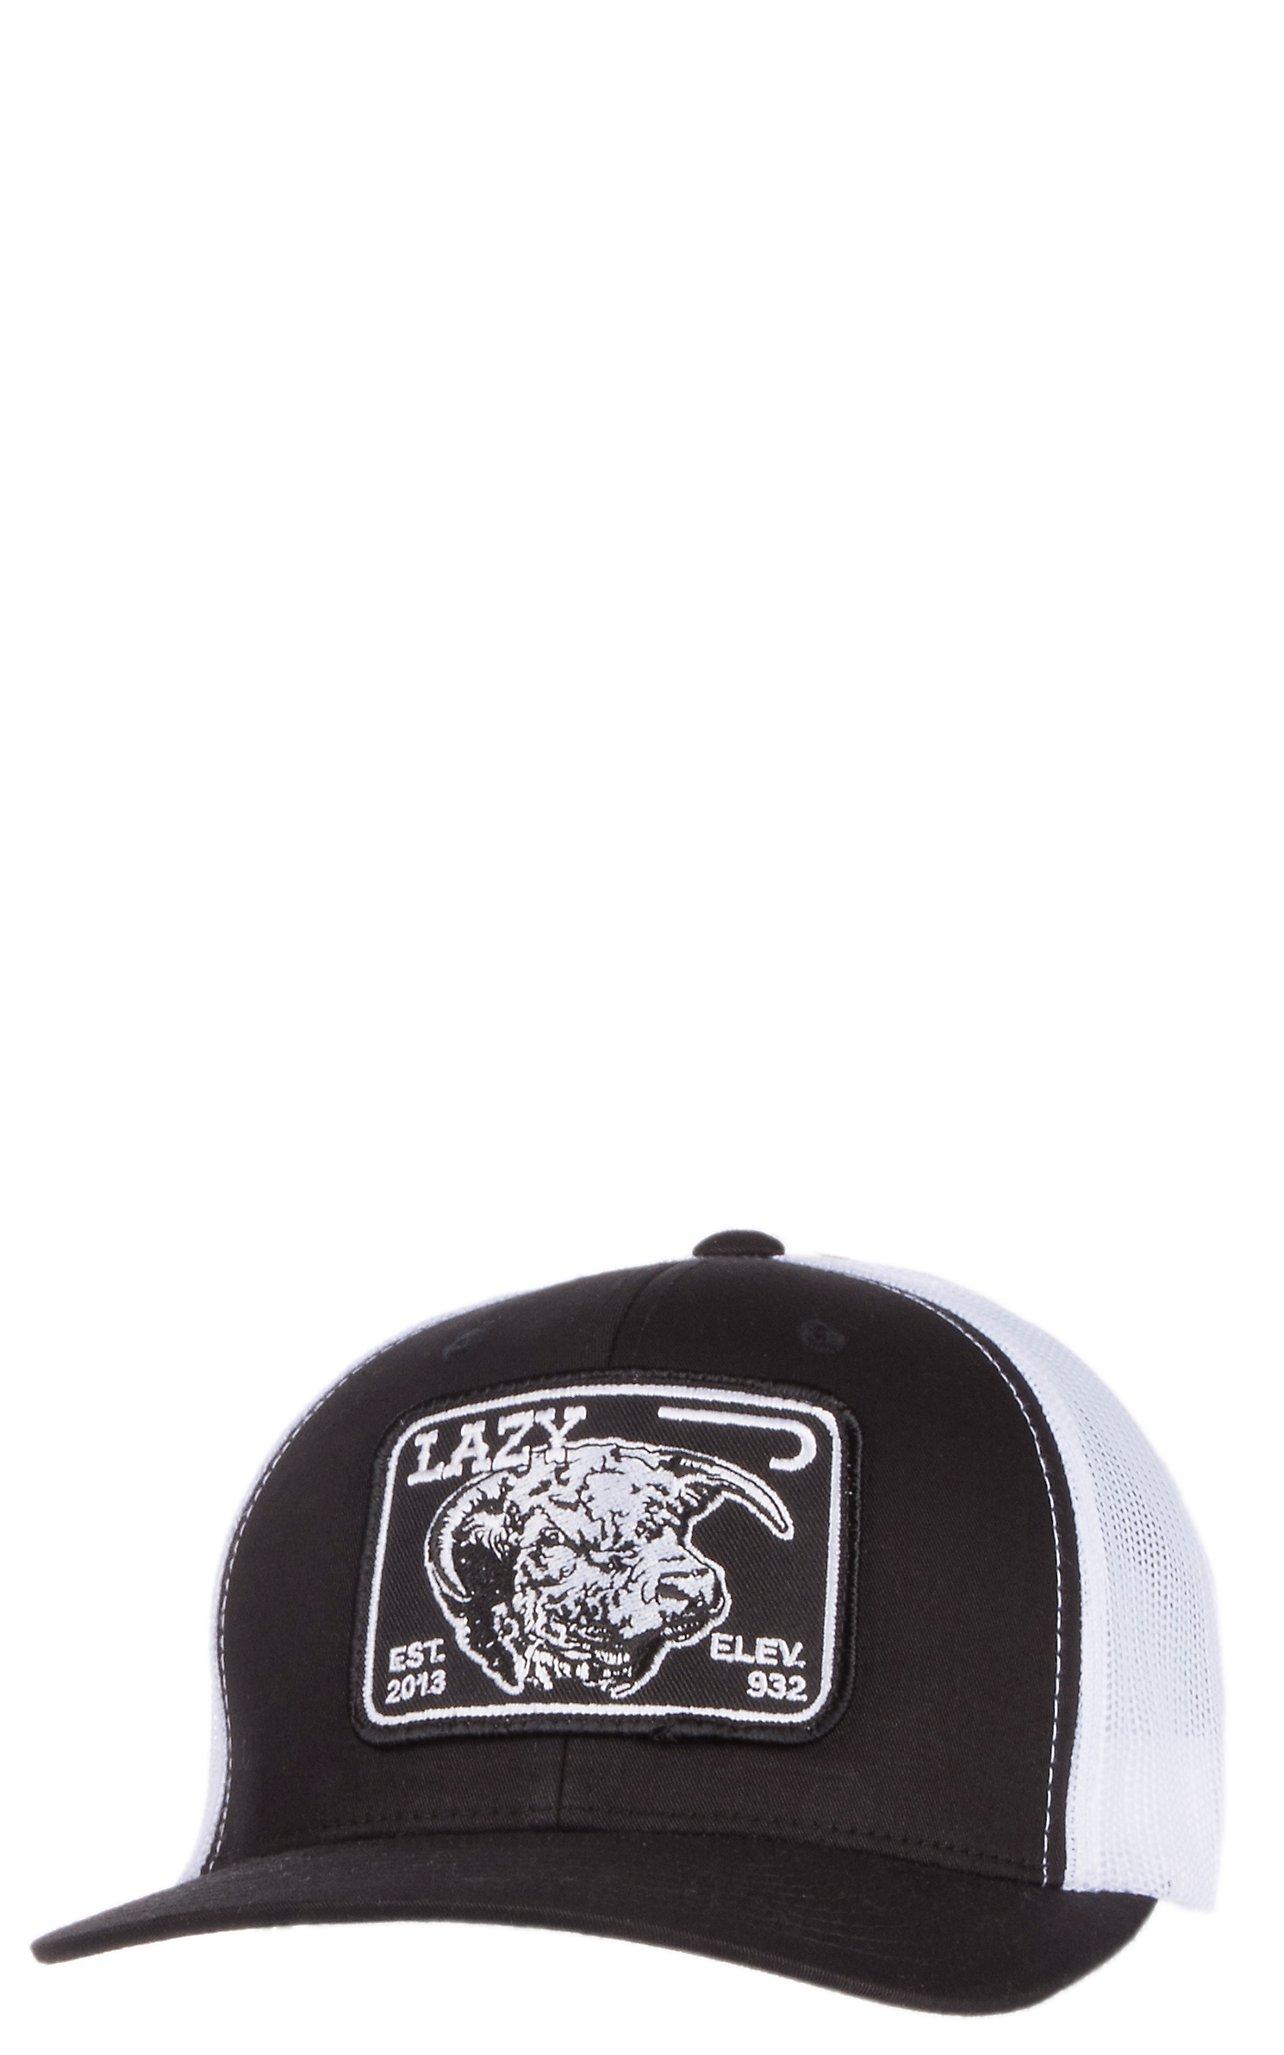 1518df7986d Lazy J Ranchwear Black   White Elevation Patch Snap Back Cap ...